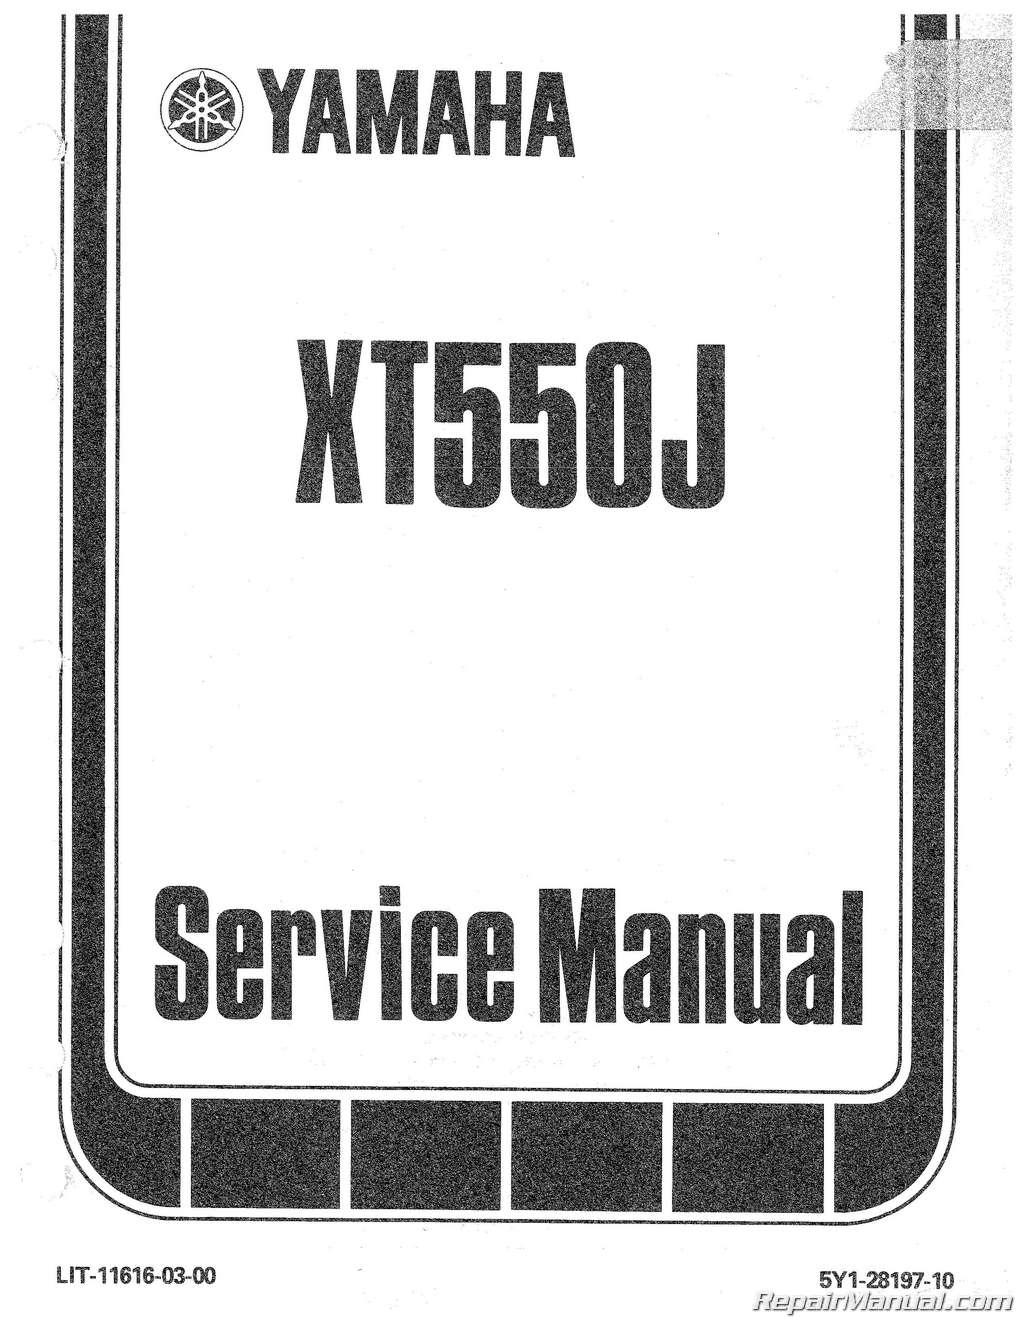 hight resolution of 1982 yamaha xt550 motorcycle service repair maintenance manual 1982 yamaha xt 550 wiring diagram yamaha xt 550 wiring diagram